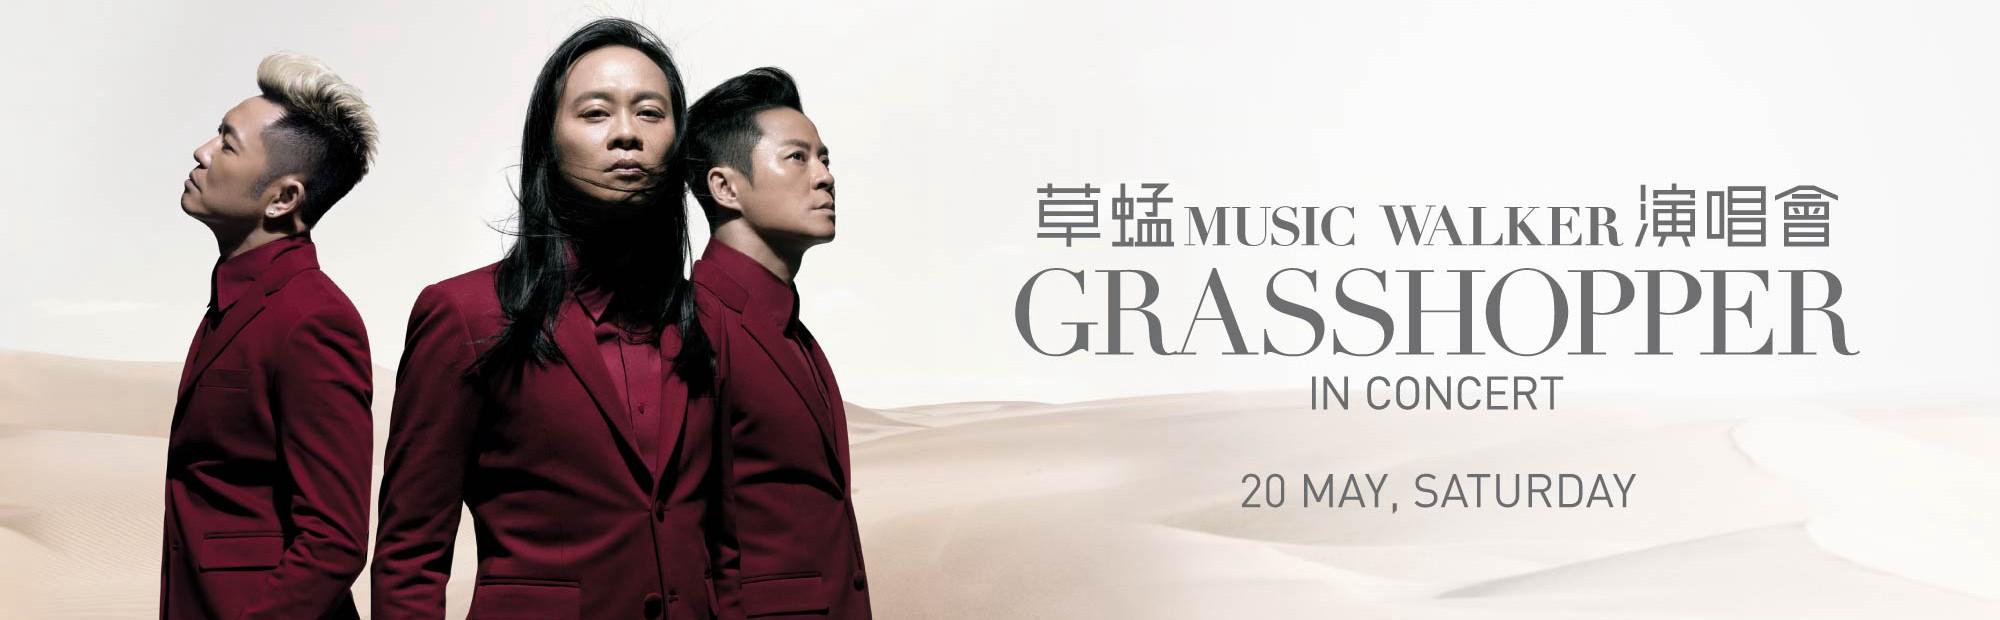 Music Walker Grasshopper in Concert - Macao